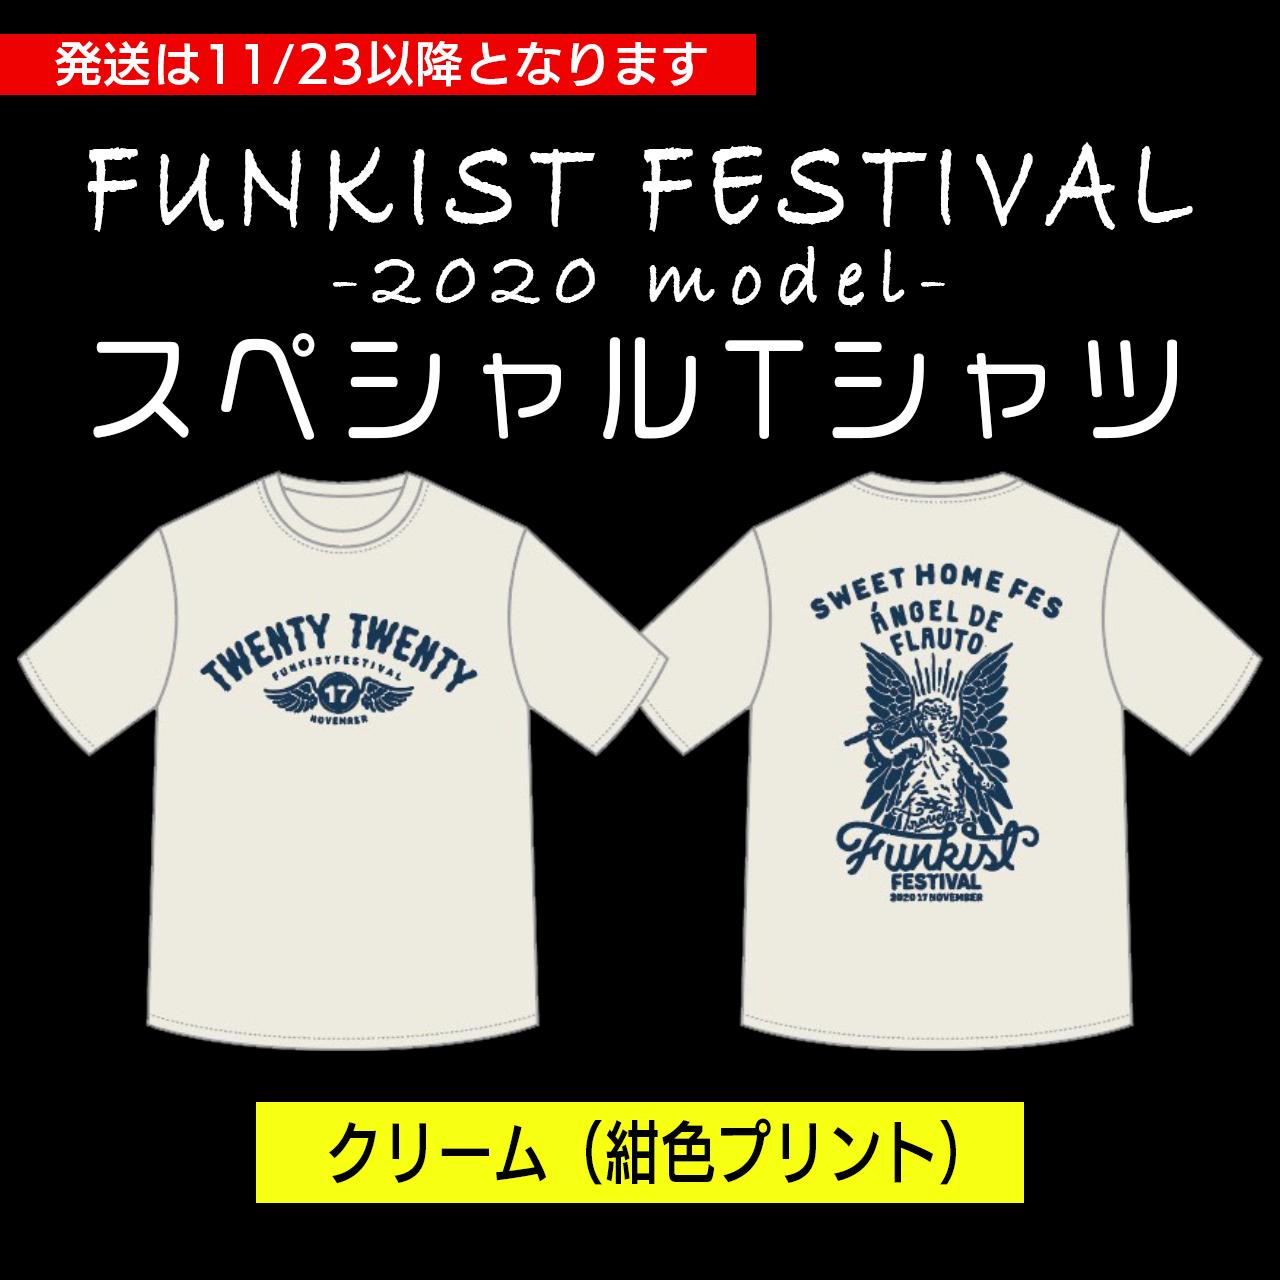 FUNKIST FESTIVAL2020 Tシャツ(クリーム・紺色プリント)